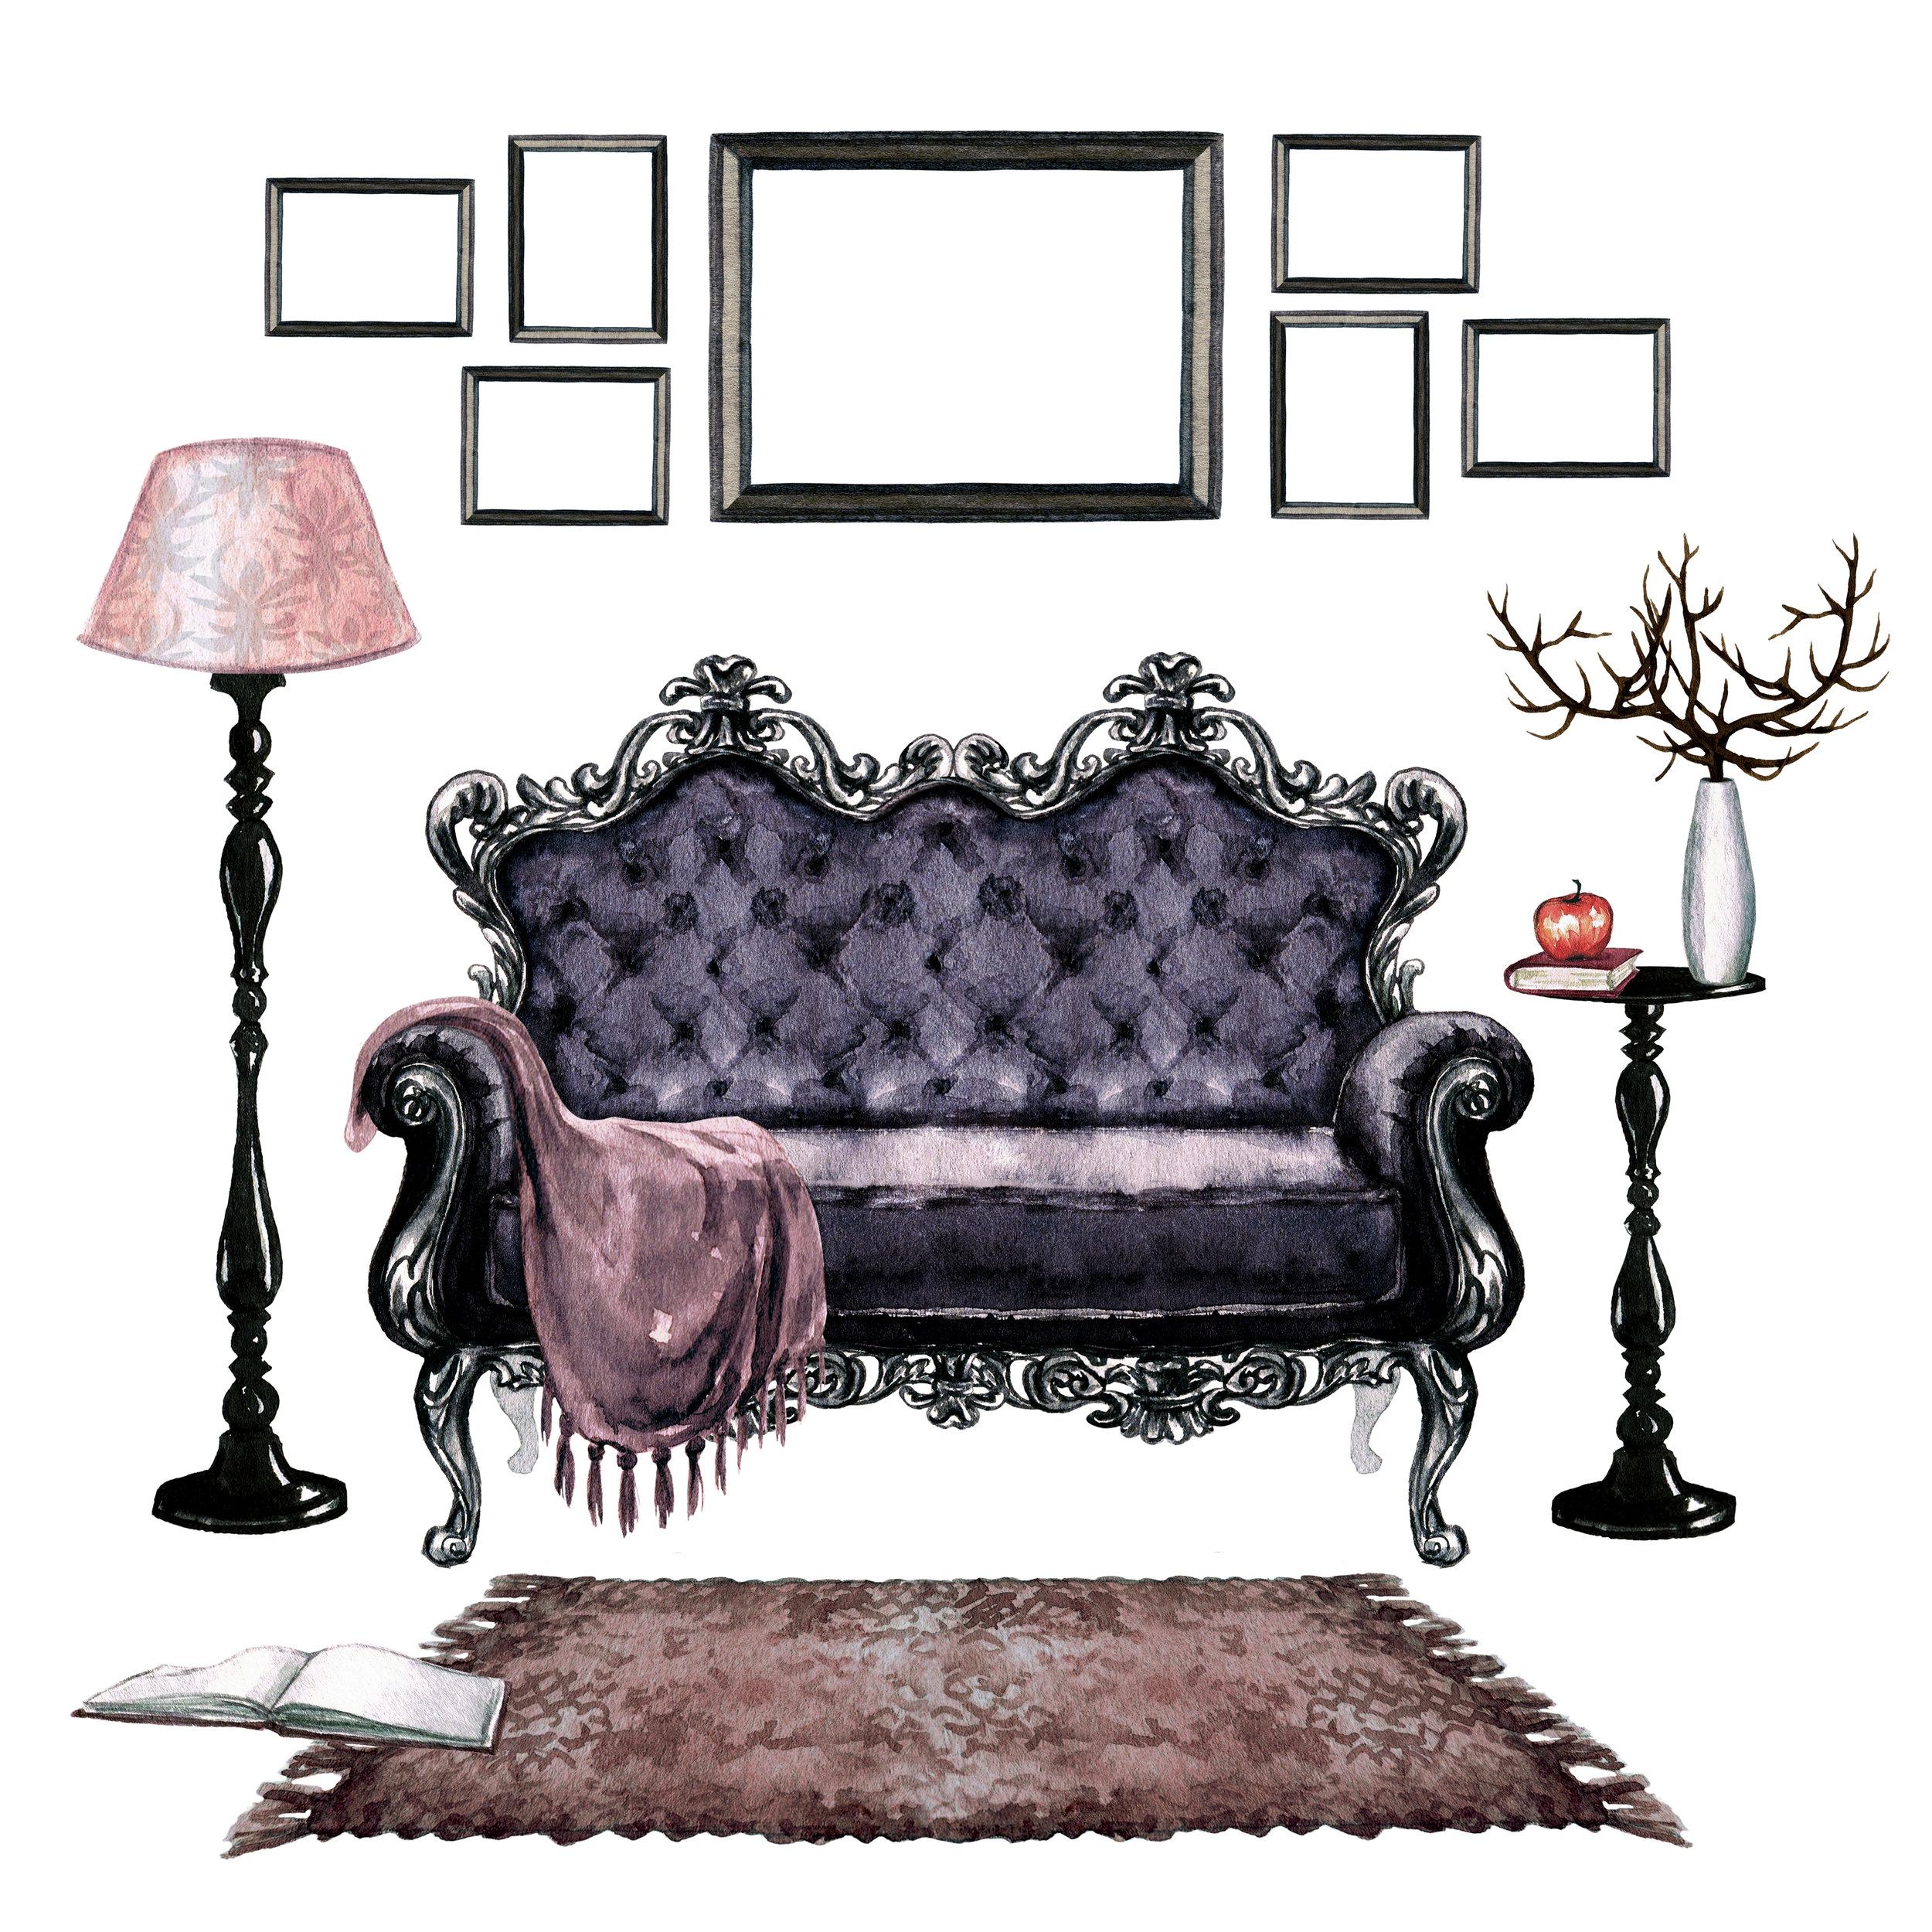 Interiors_LivingRoom_10_0117.jpg